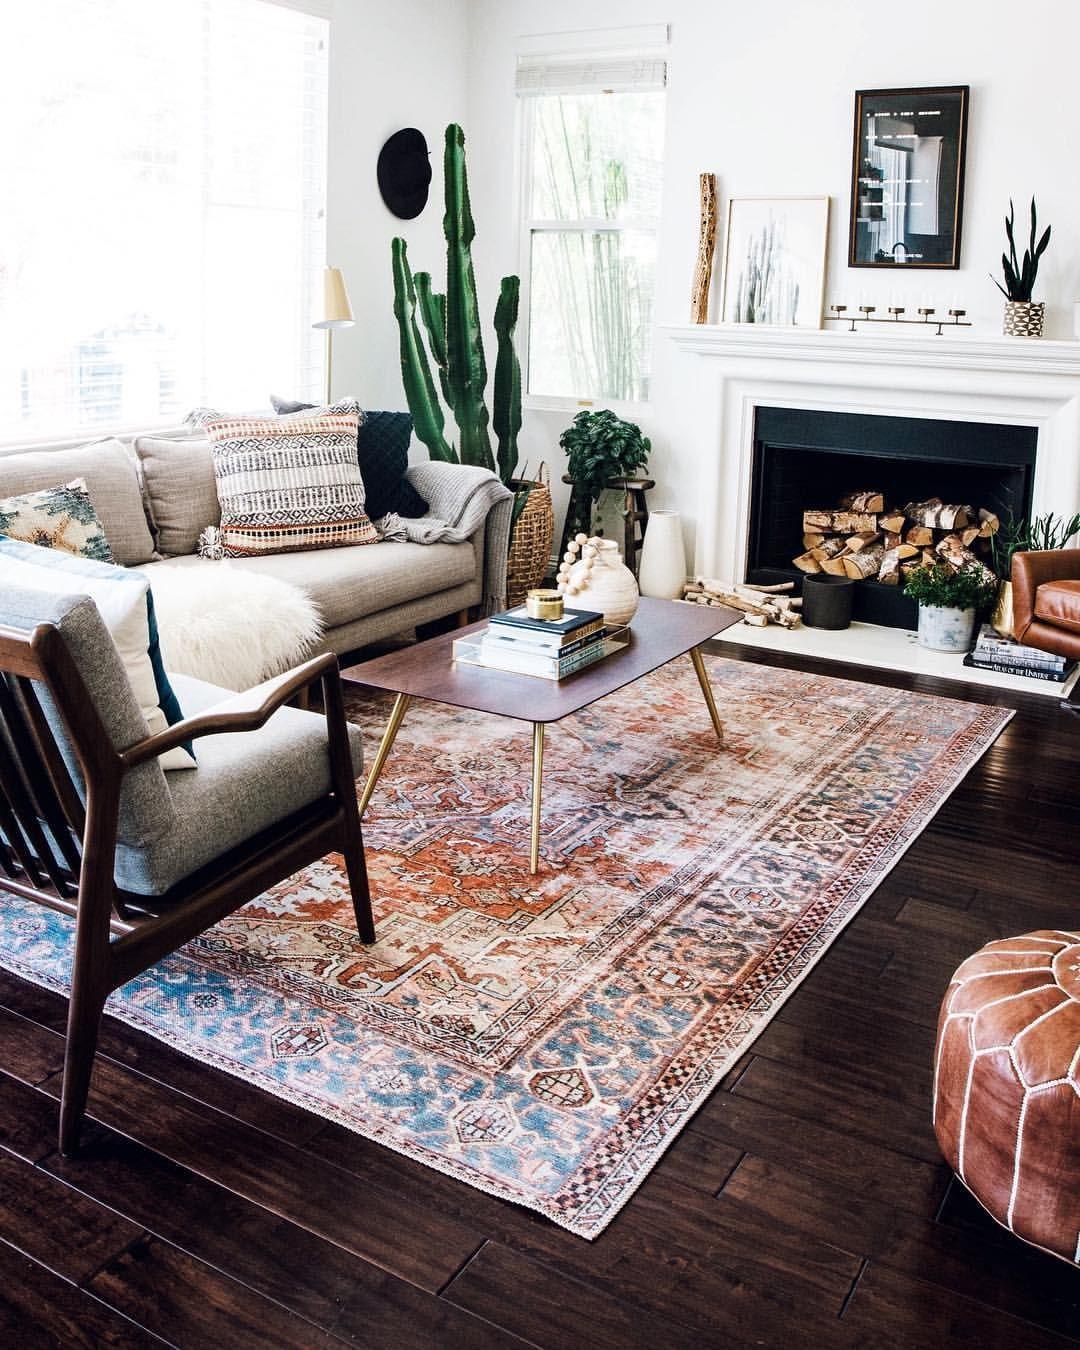 The Best Living Room Rugs Inspiration Interiordesign Rugs Homedecor Decoration Farm House Living Room Sitting Room Design Mid Century Modern Living Room #rug #ideas #for #small #living #room